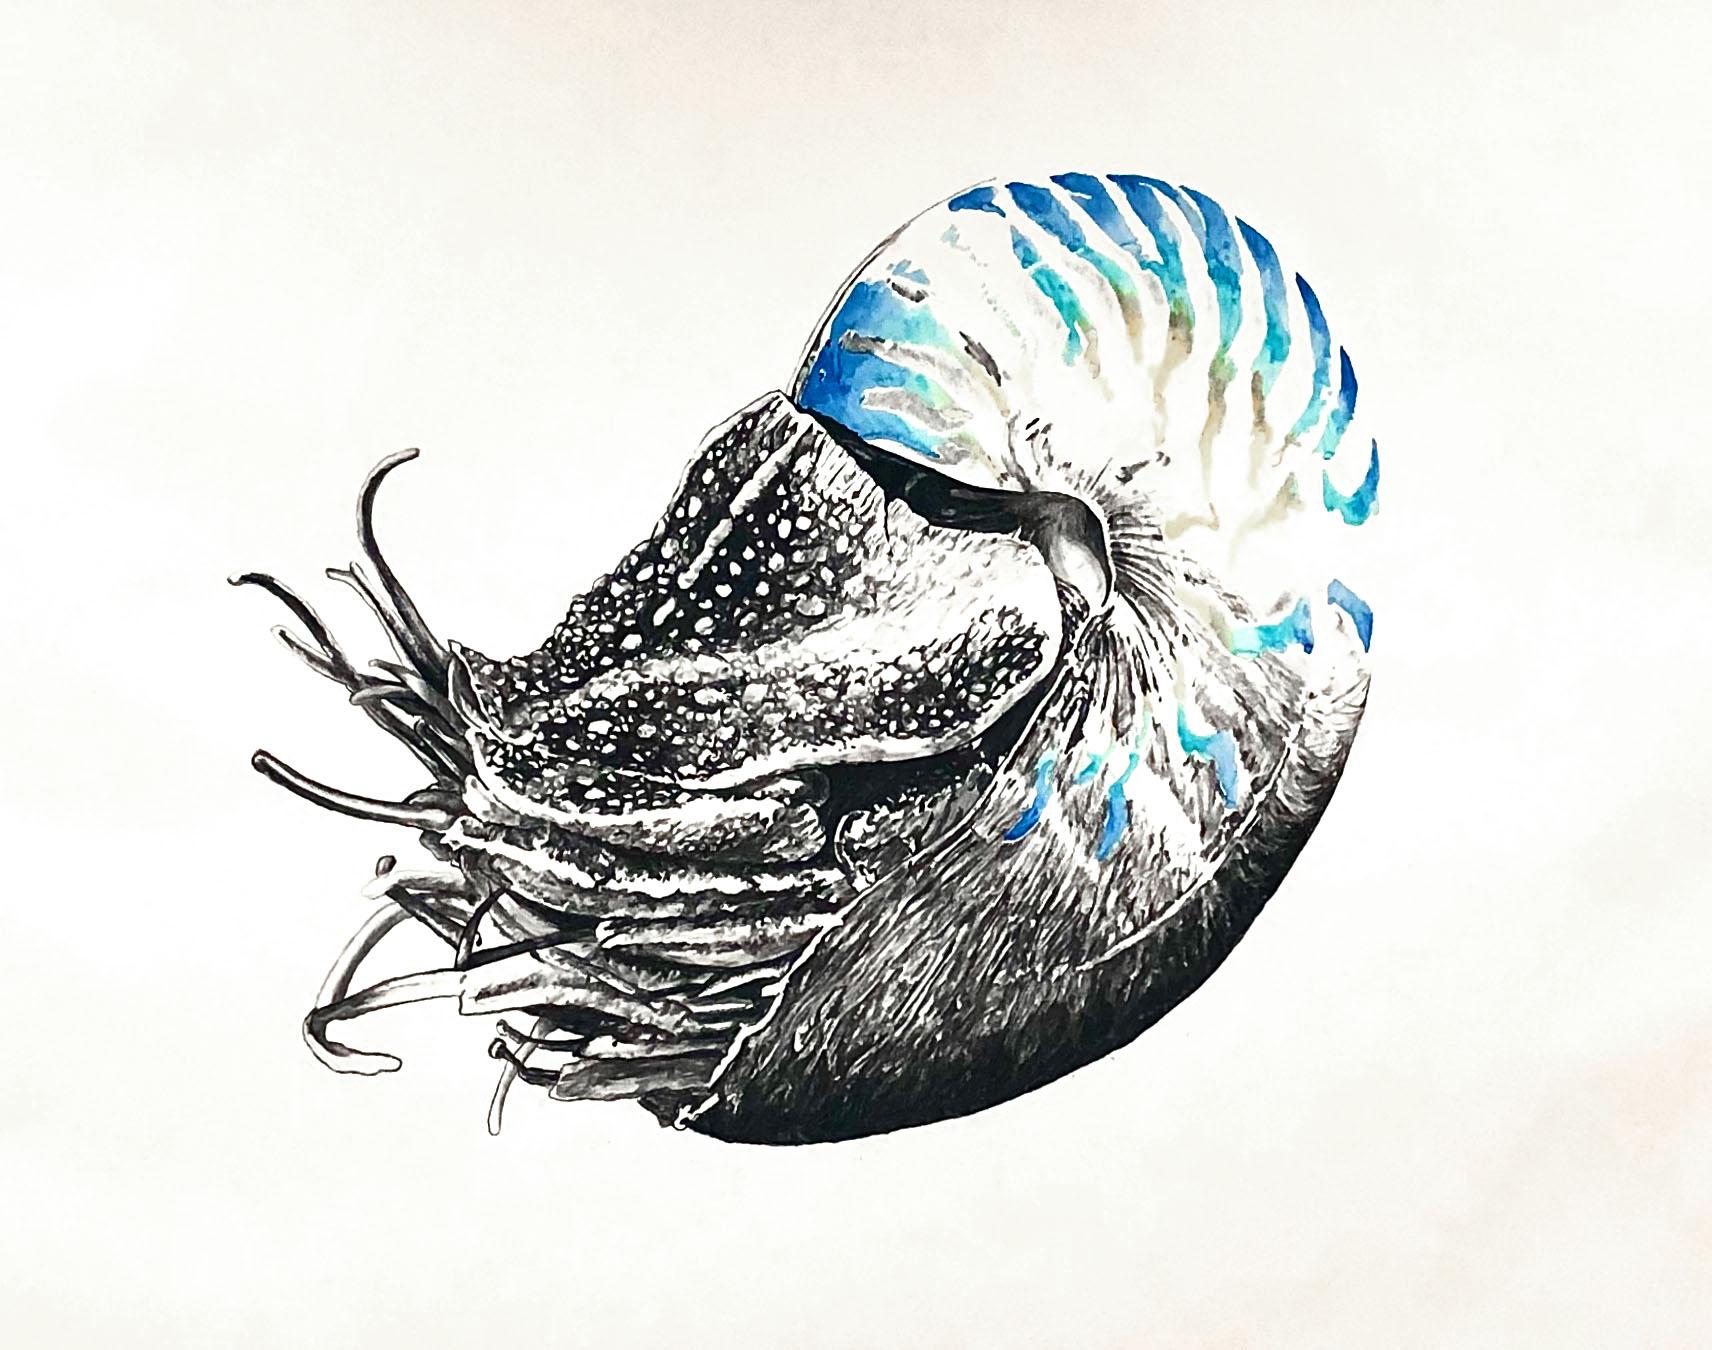 Nautilus 100x140cm charcoal, watercolor 2020